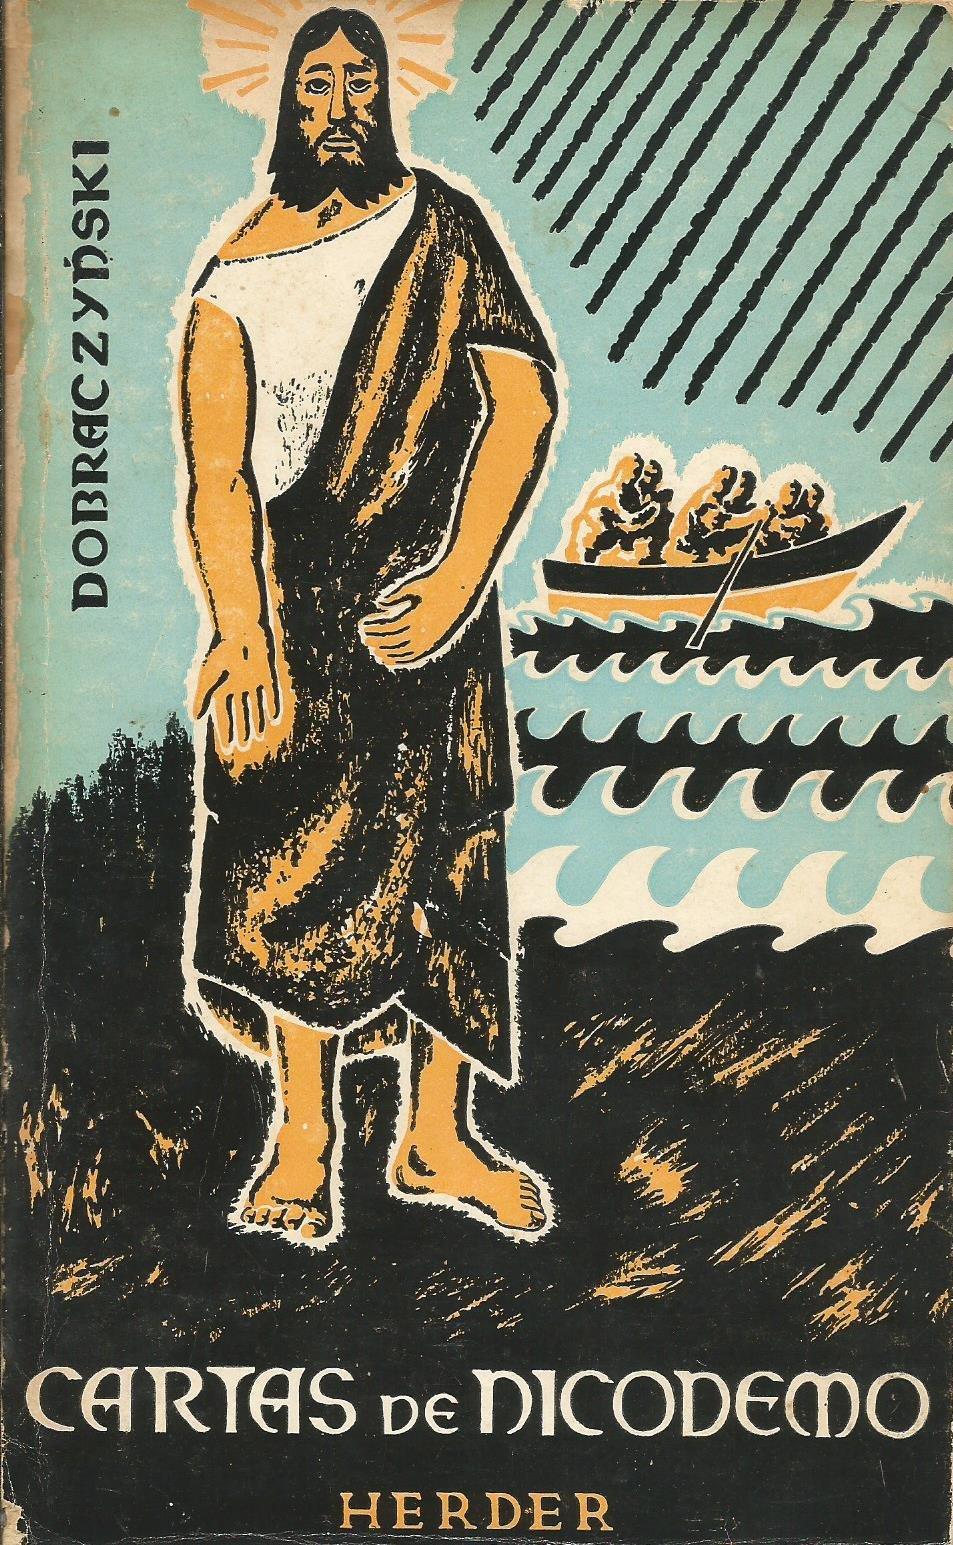 Cartas de Nicodemo: Amazon.es: Jan.- DOBRACZYNSKI: Libros